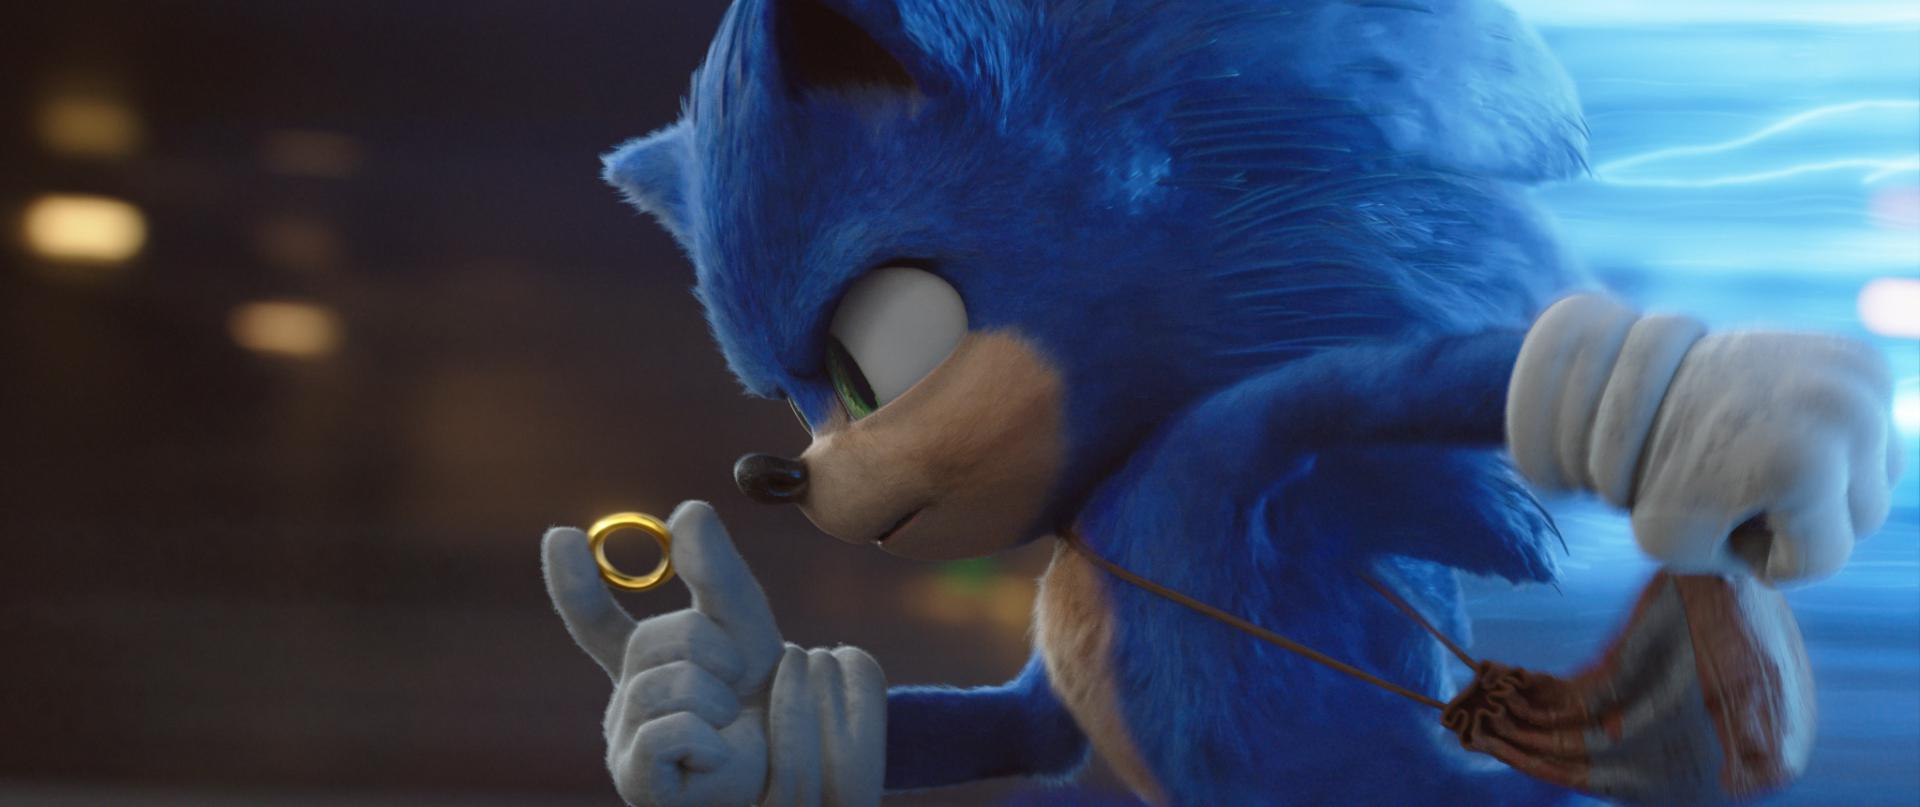 Granger On Film Sonic The Hedgehog Is A Box Office Bonanza Westport News